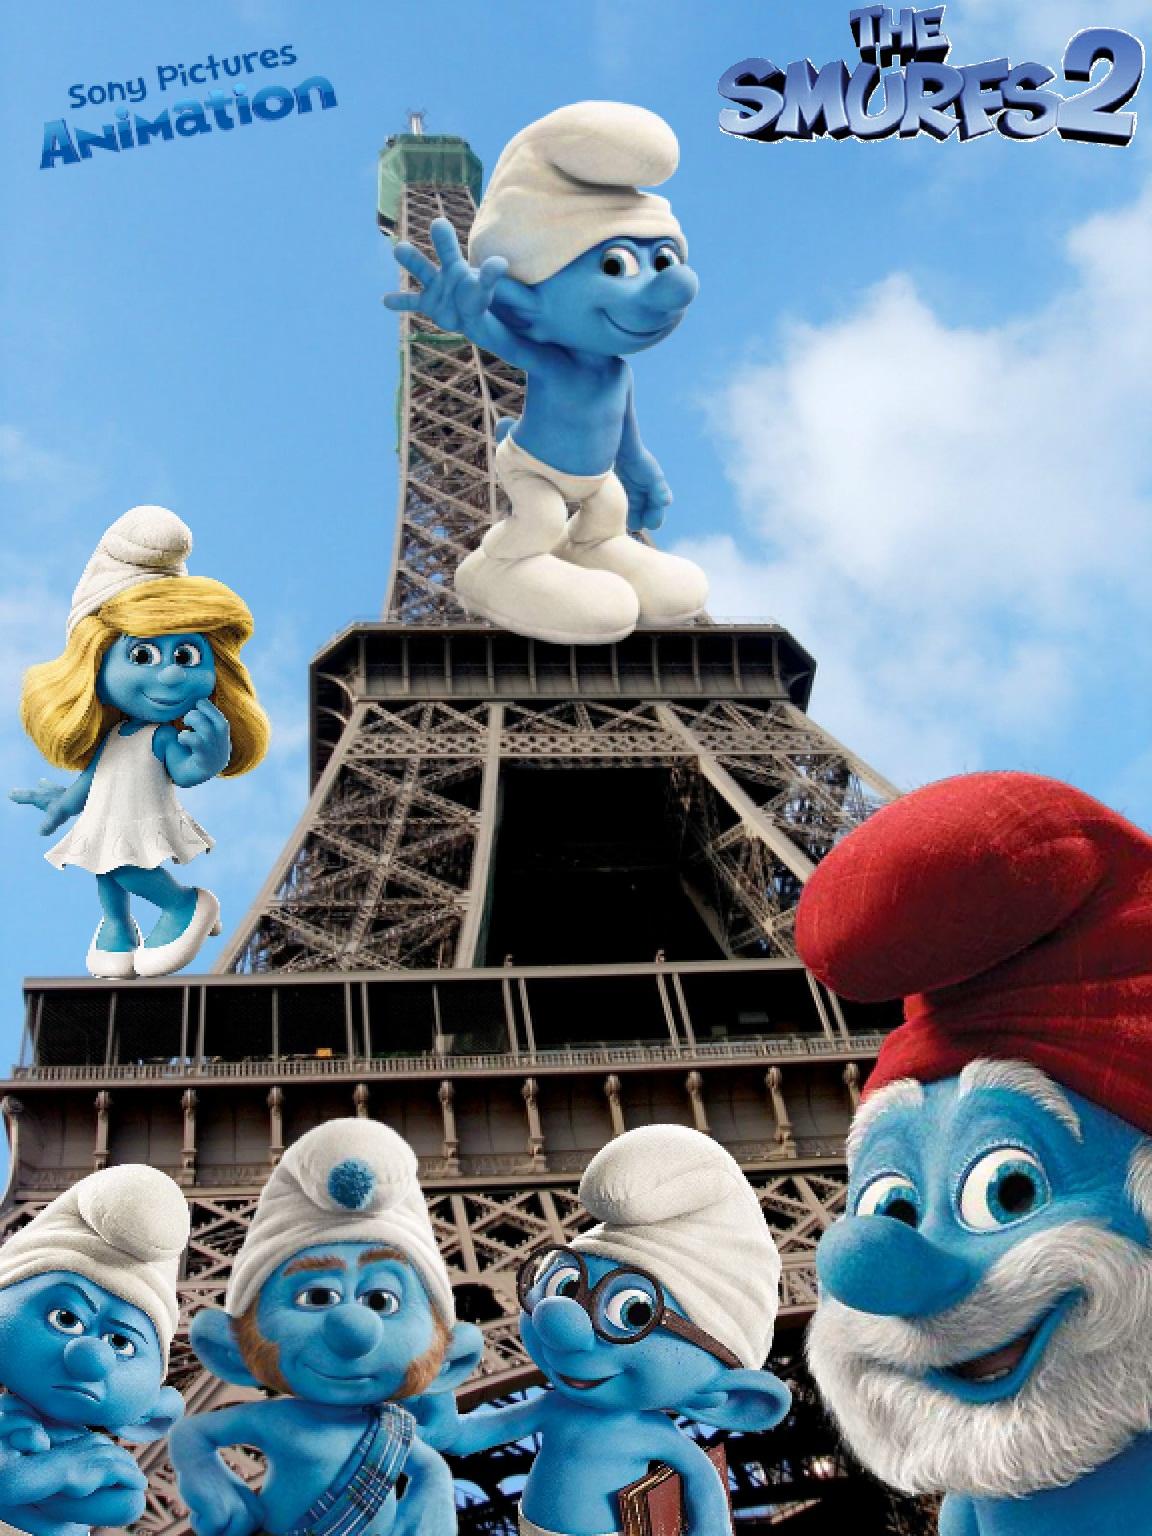 Watch Movies Online Megavideo: Watch The Smurfs 2 (2013) Online ...